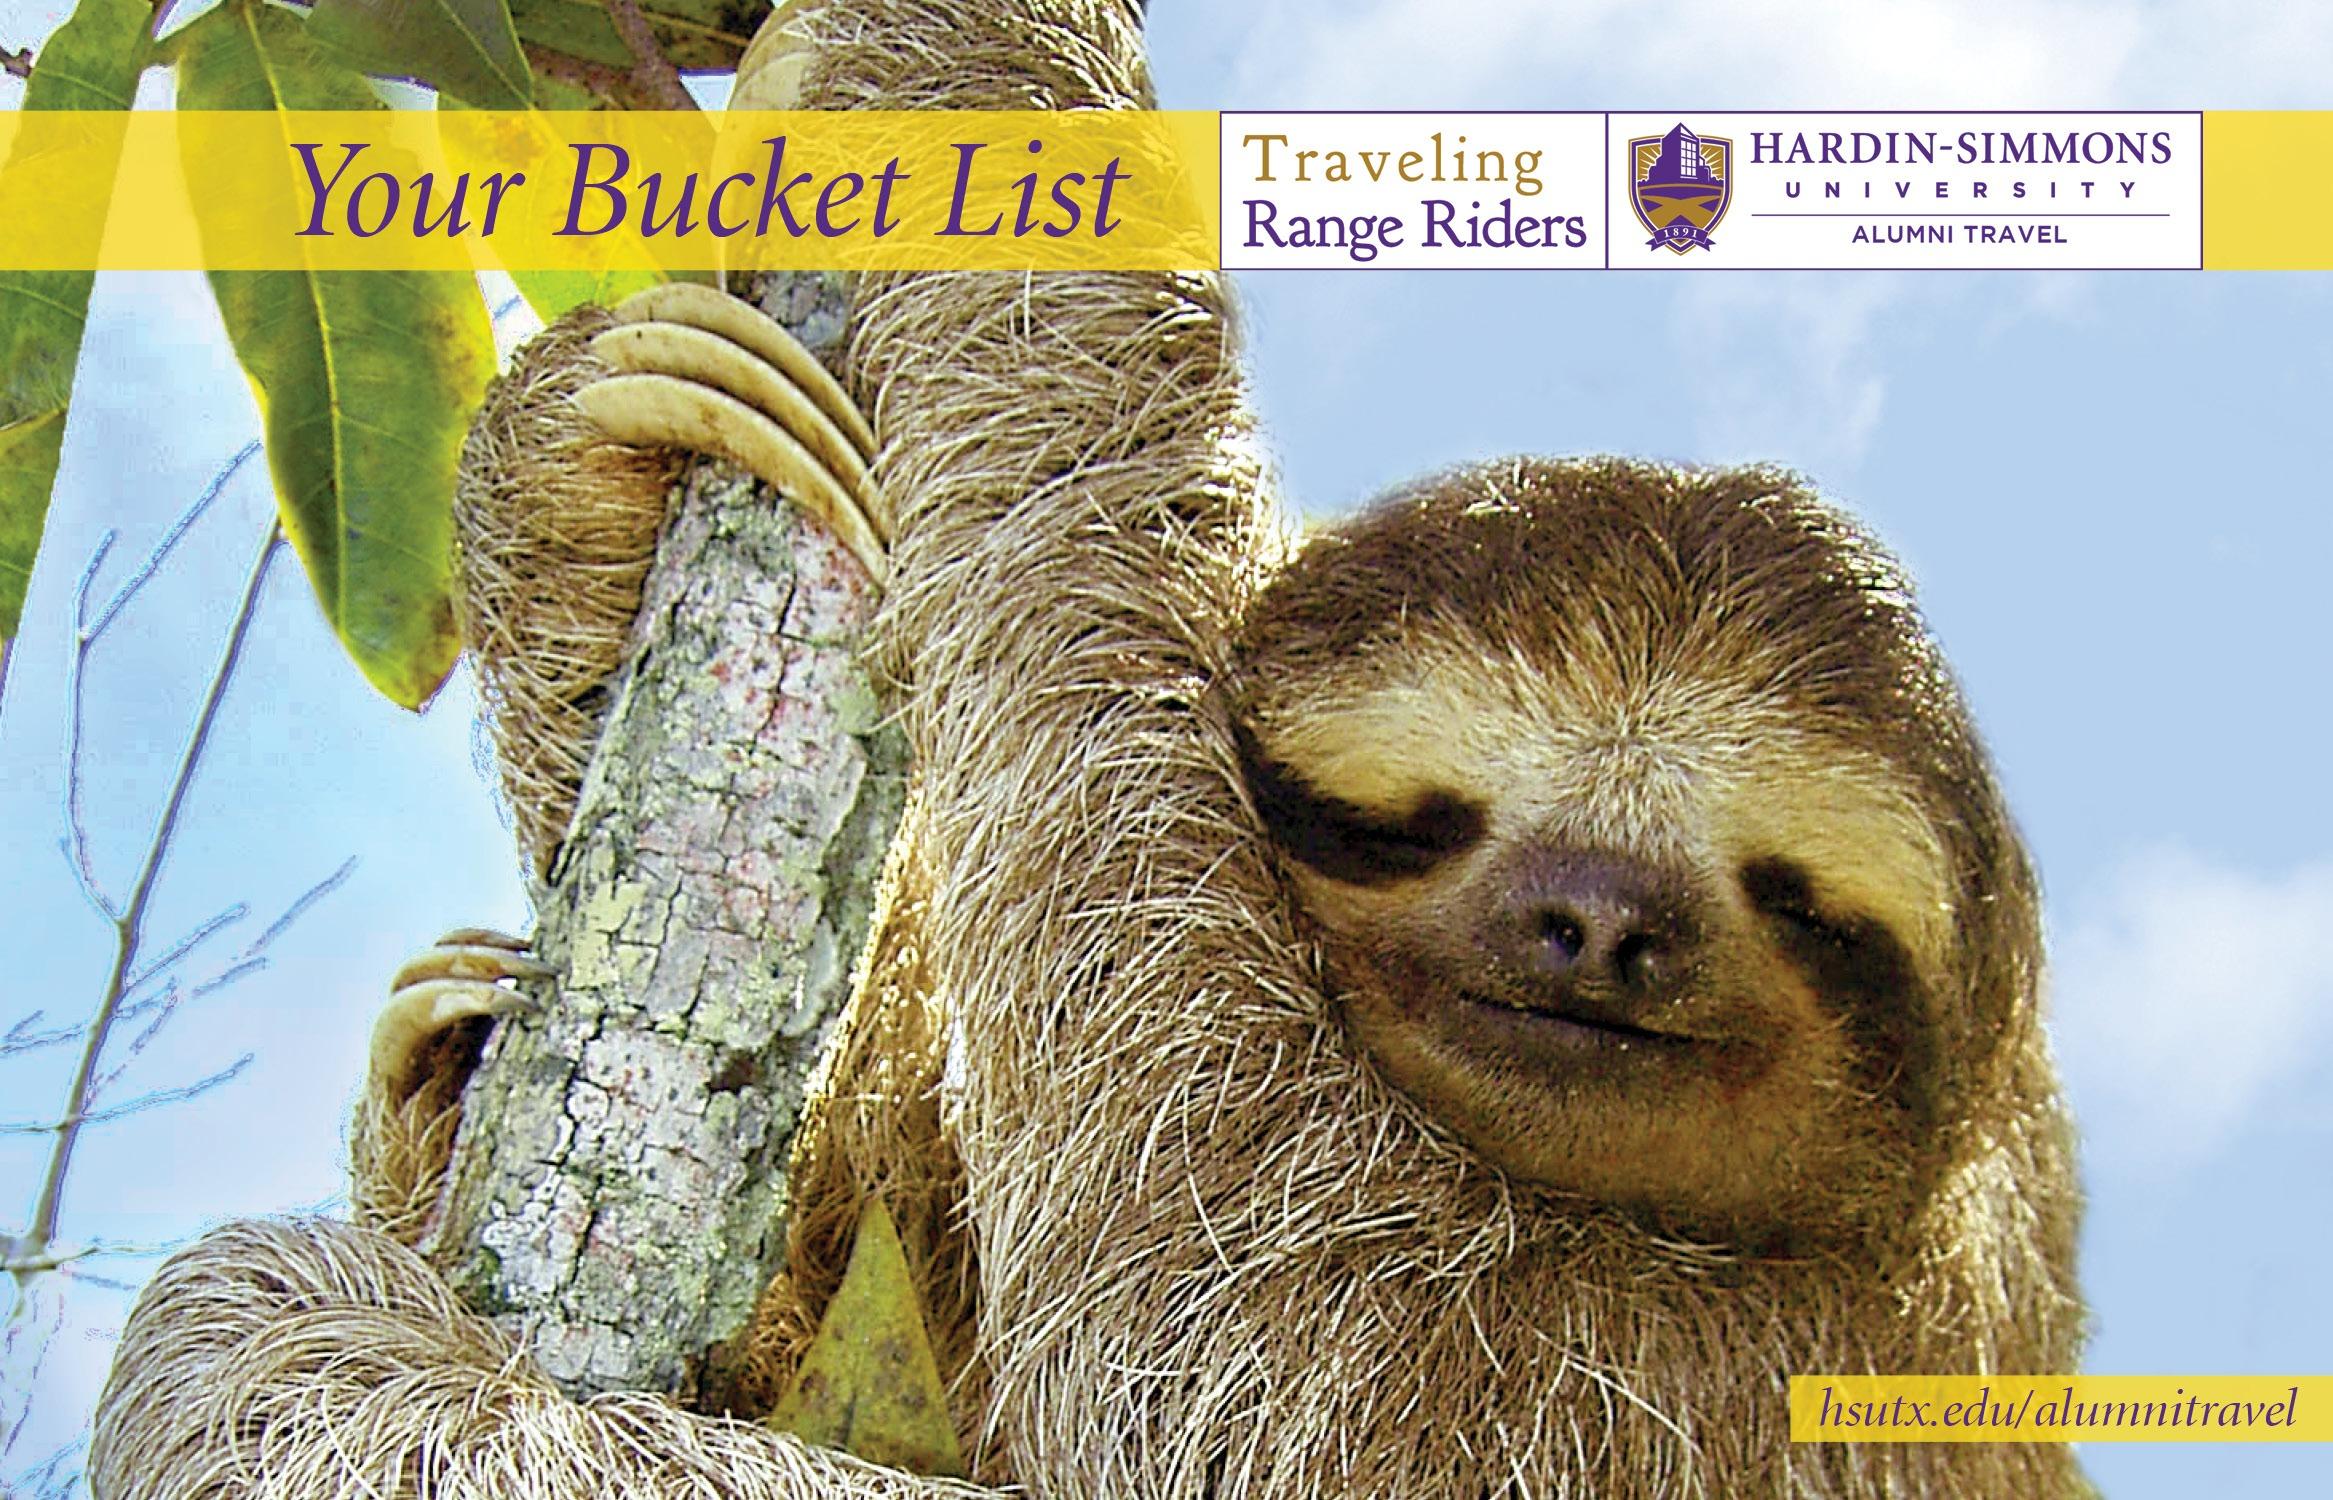 Hsu Traveling Range Riders | Hardin Simmons University Throughout August 2021 Calendar Hsu